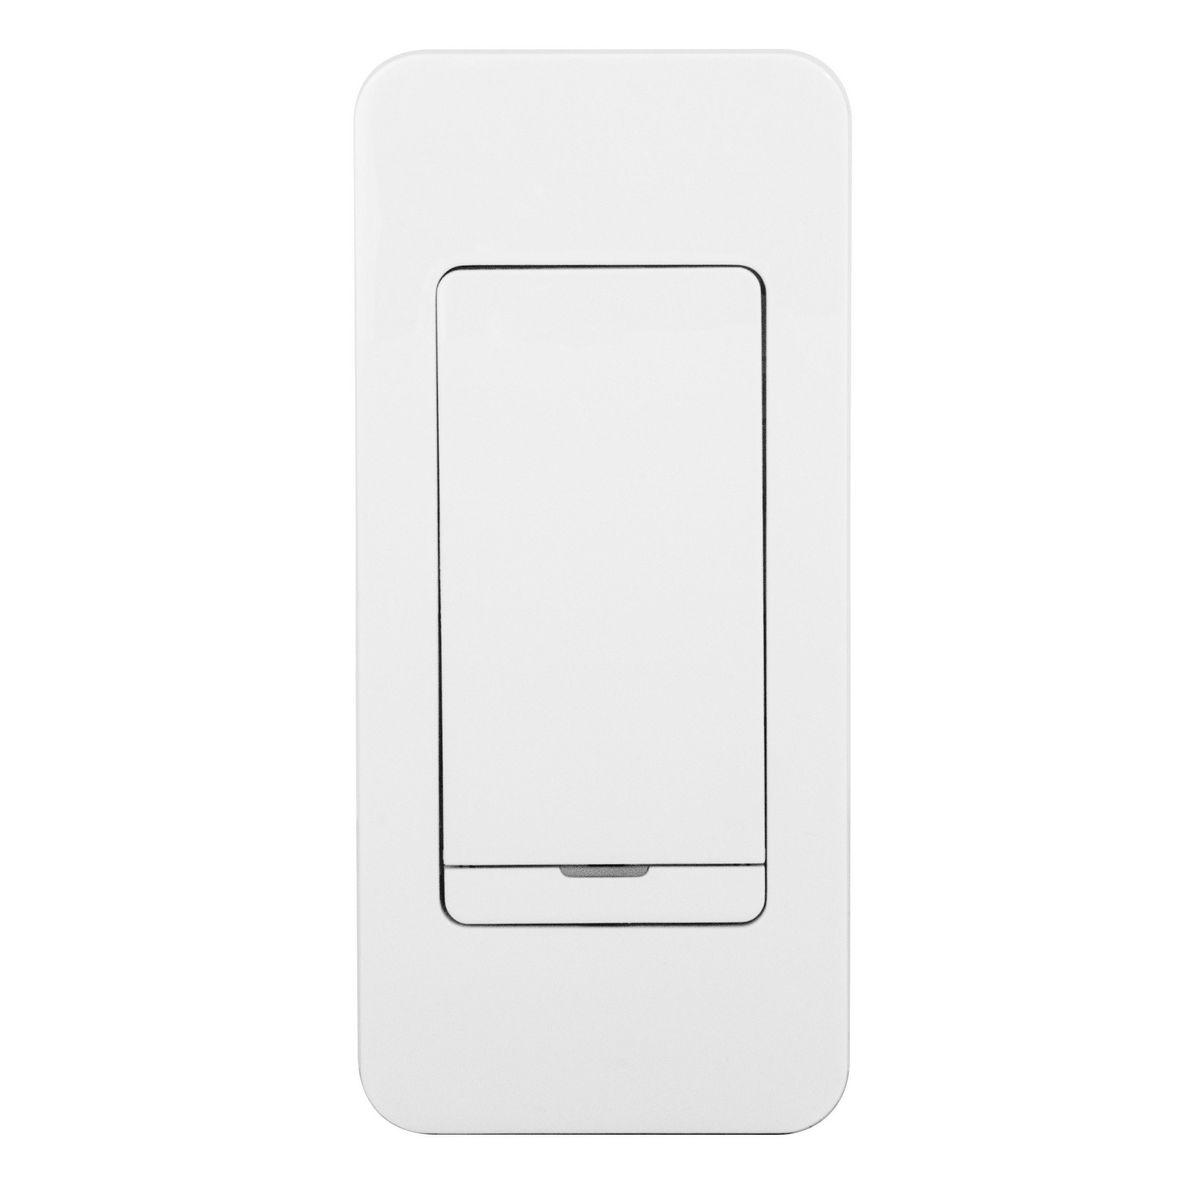 Hubbell IDEV0020